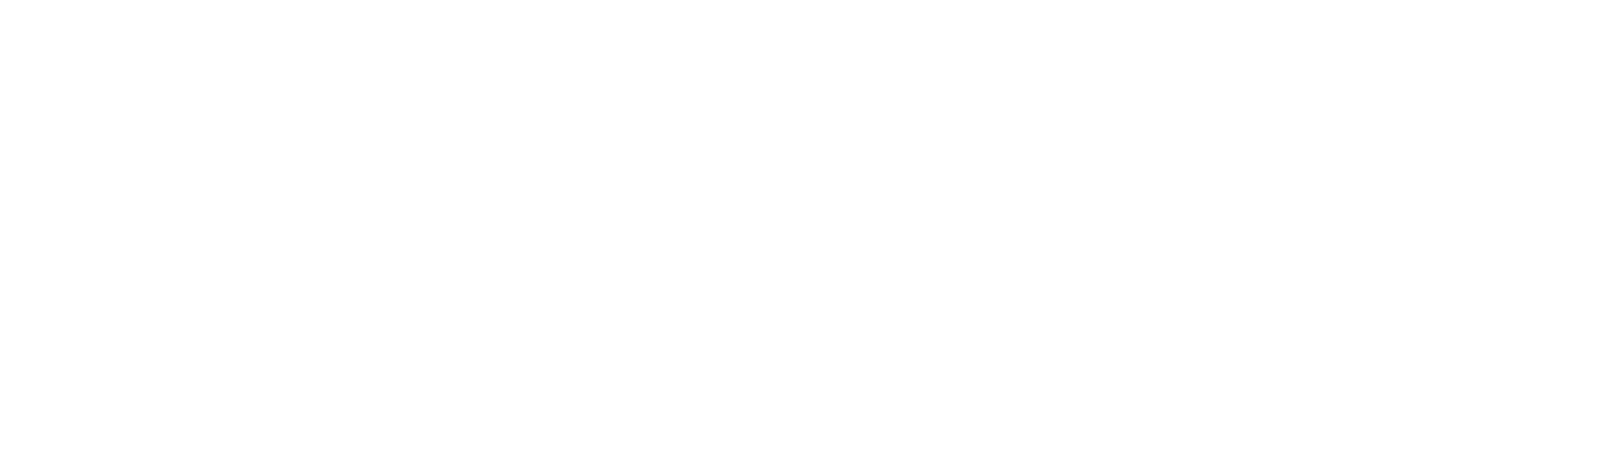 Gary Gionet